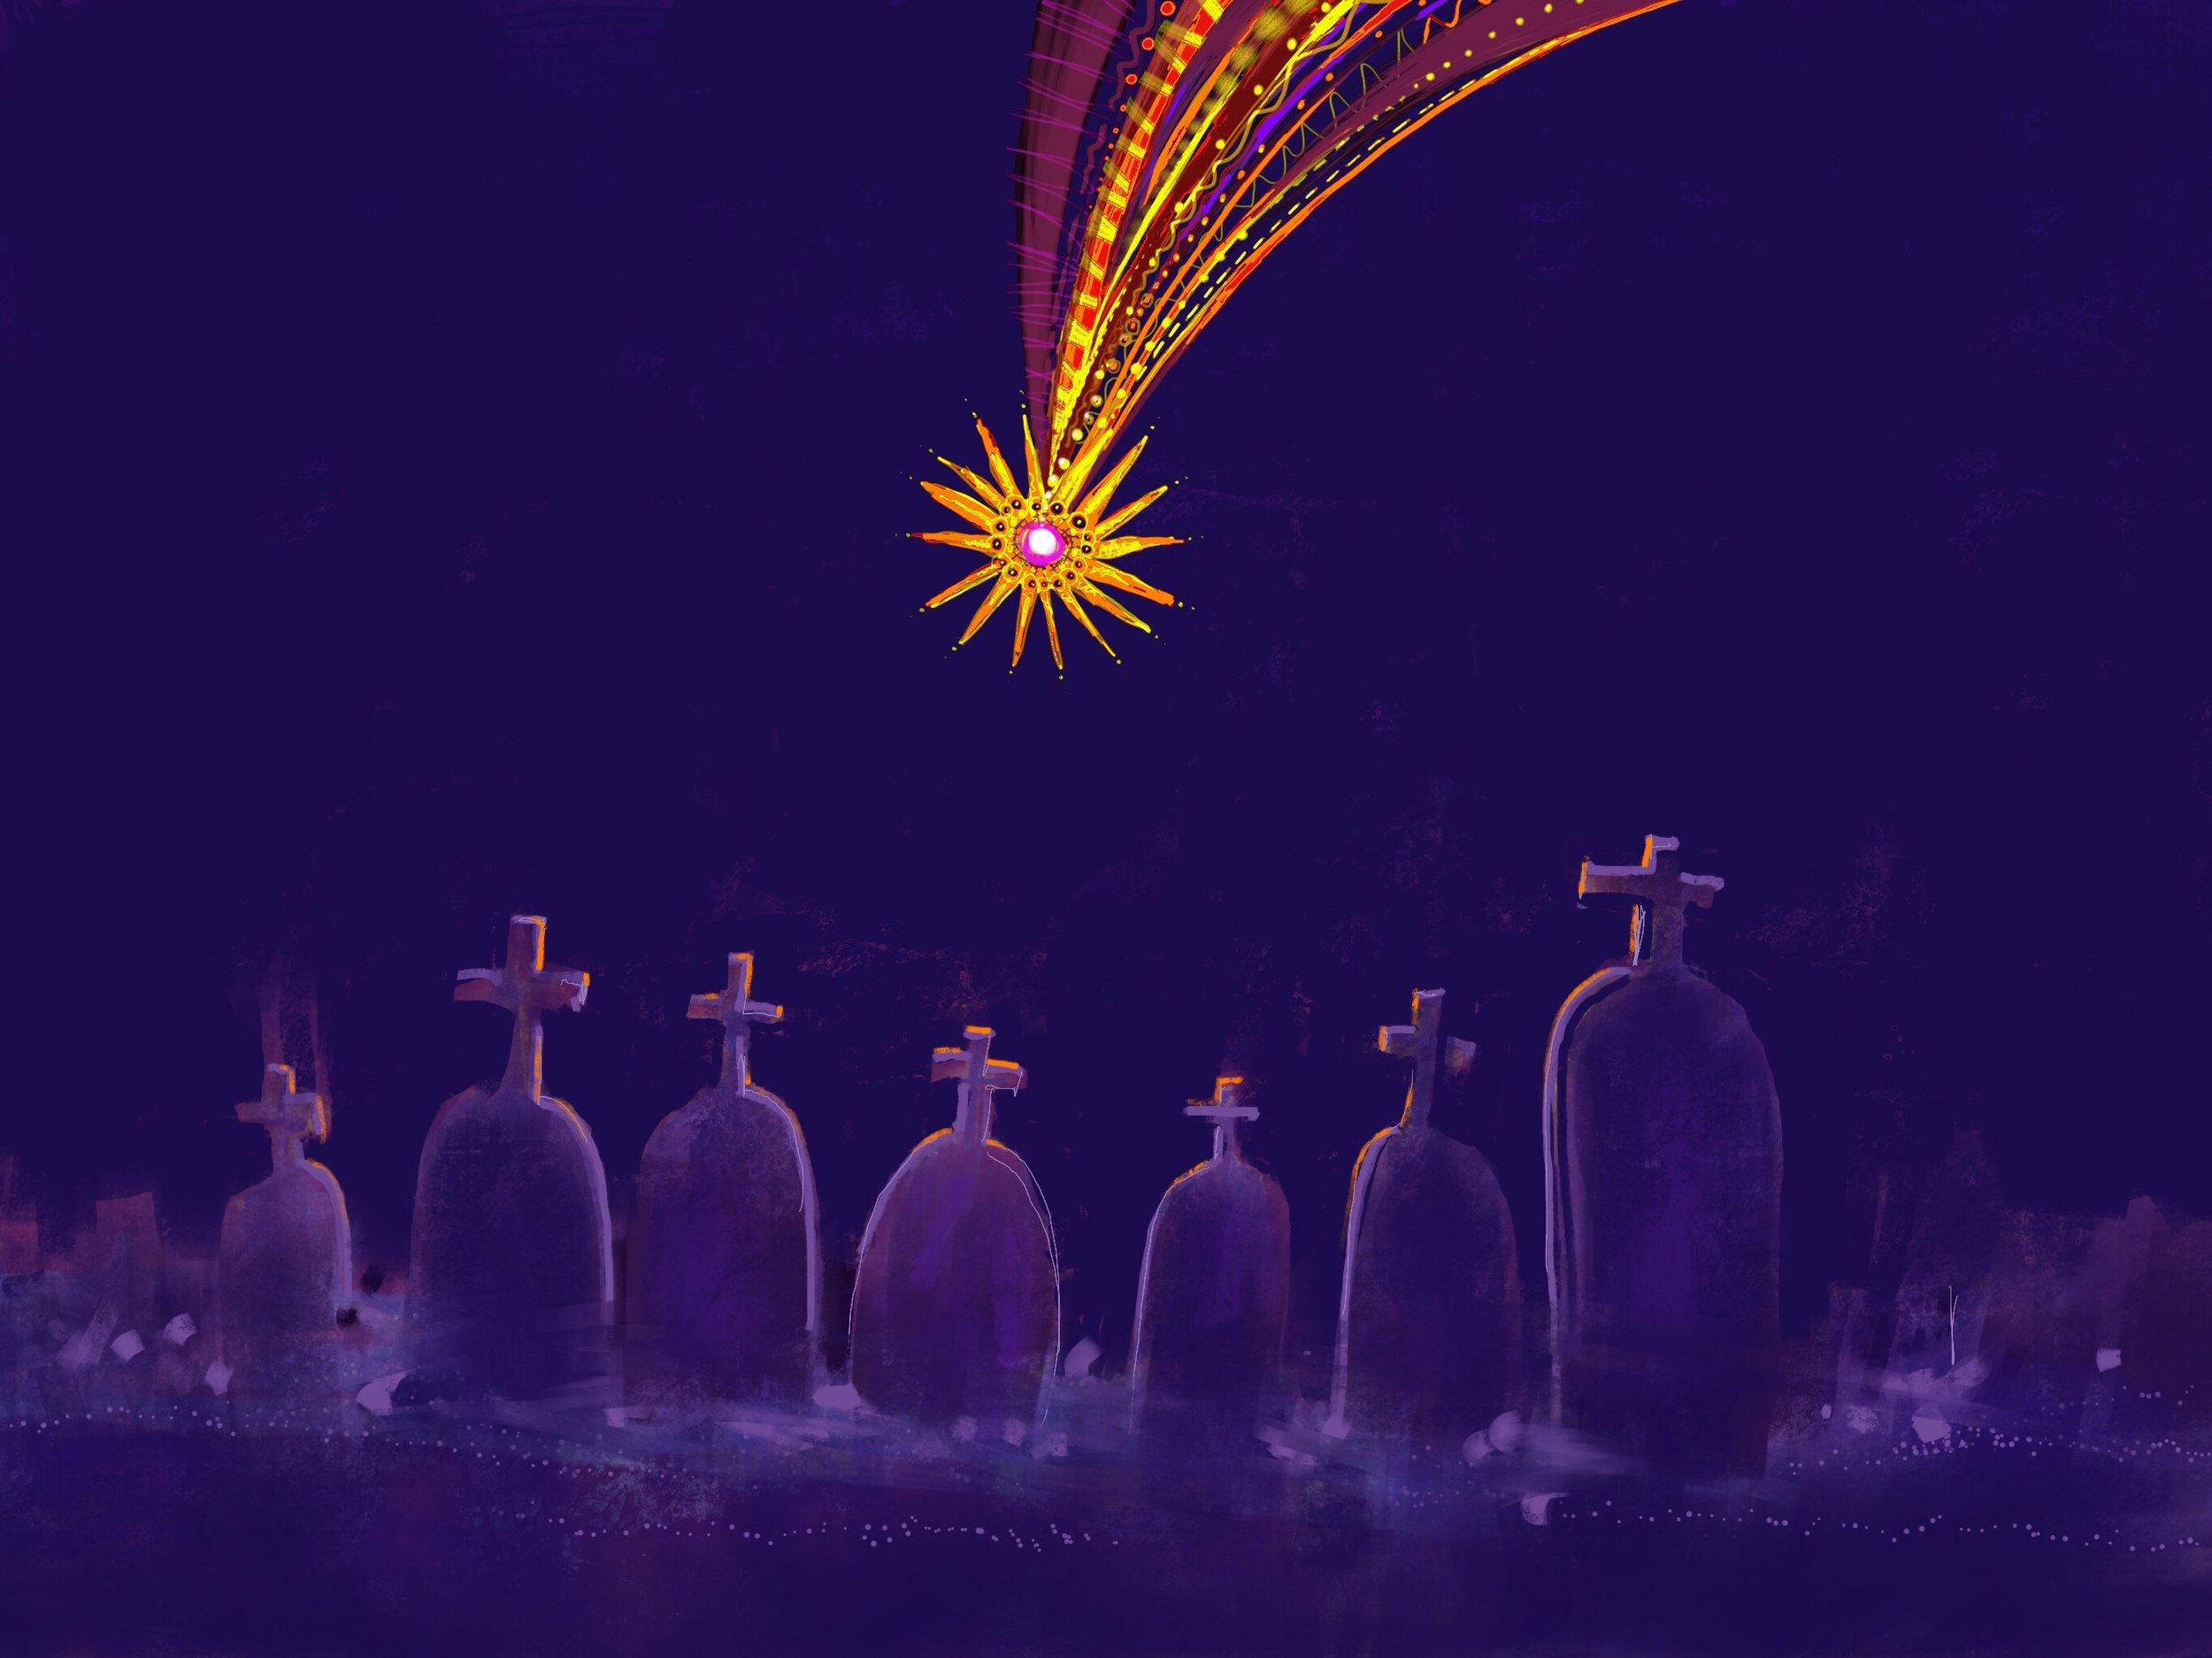 Cemetery-NIGHT-COMET.jpg